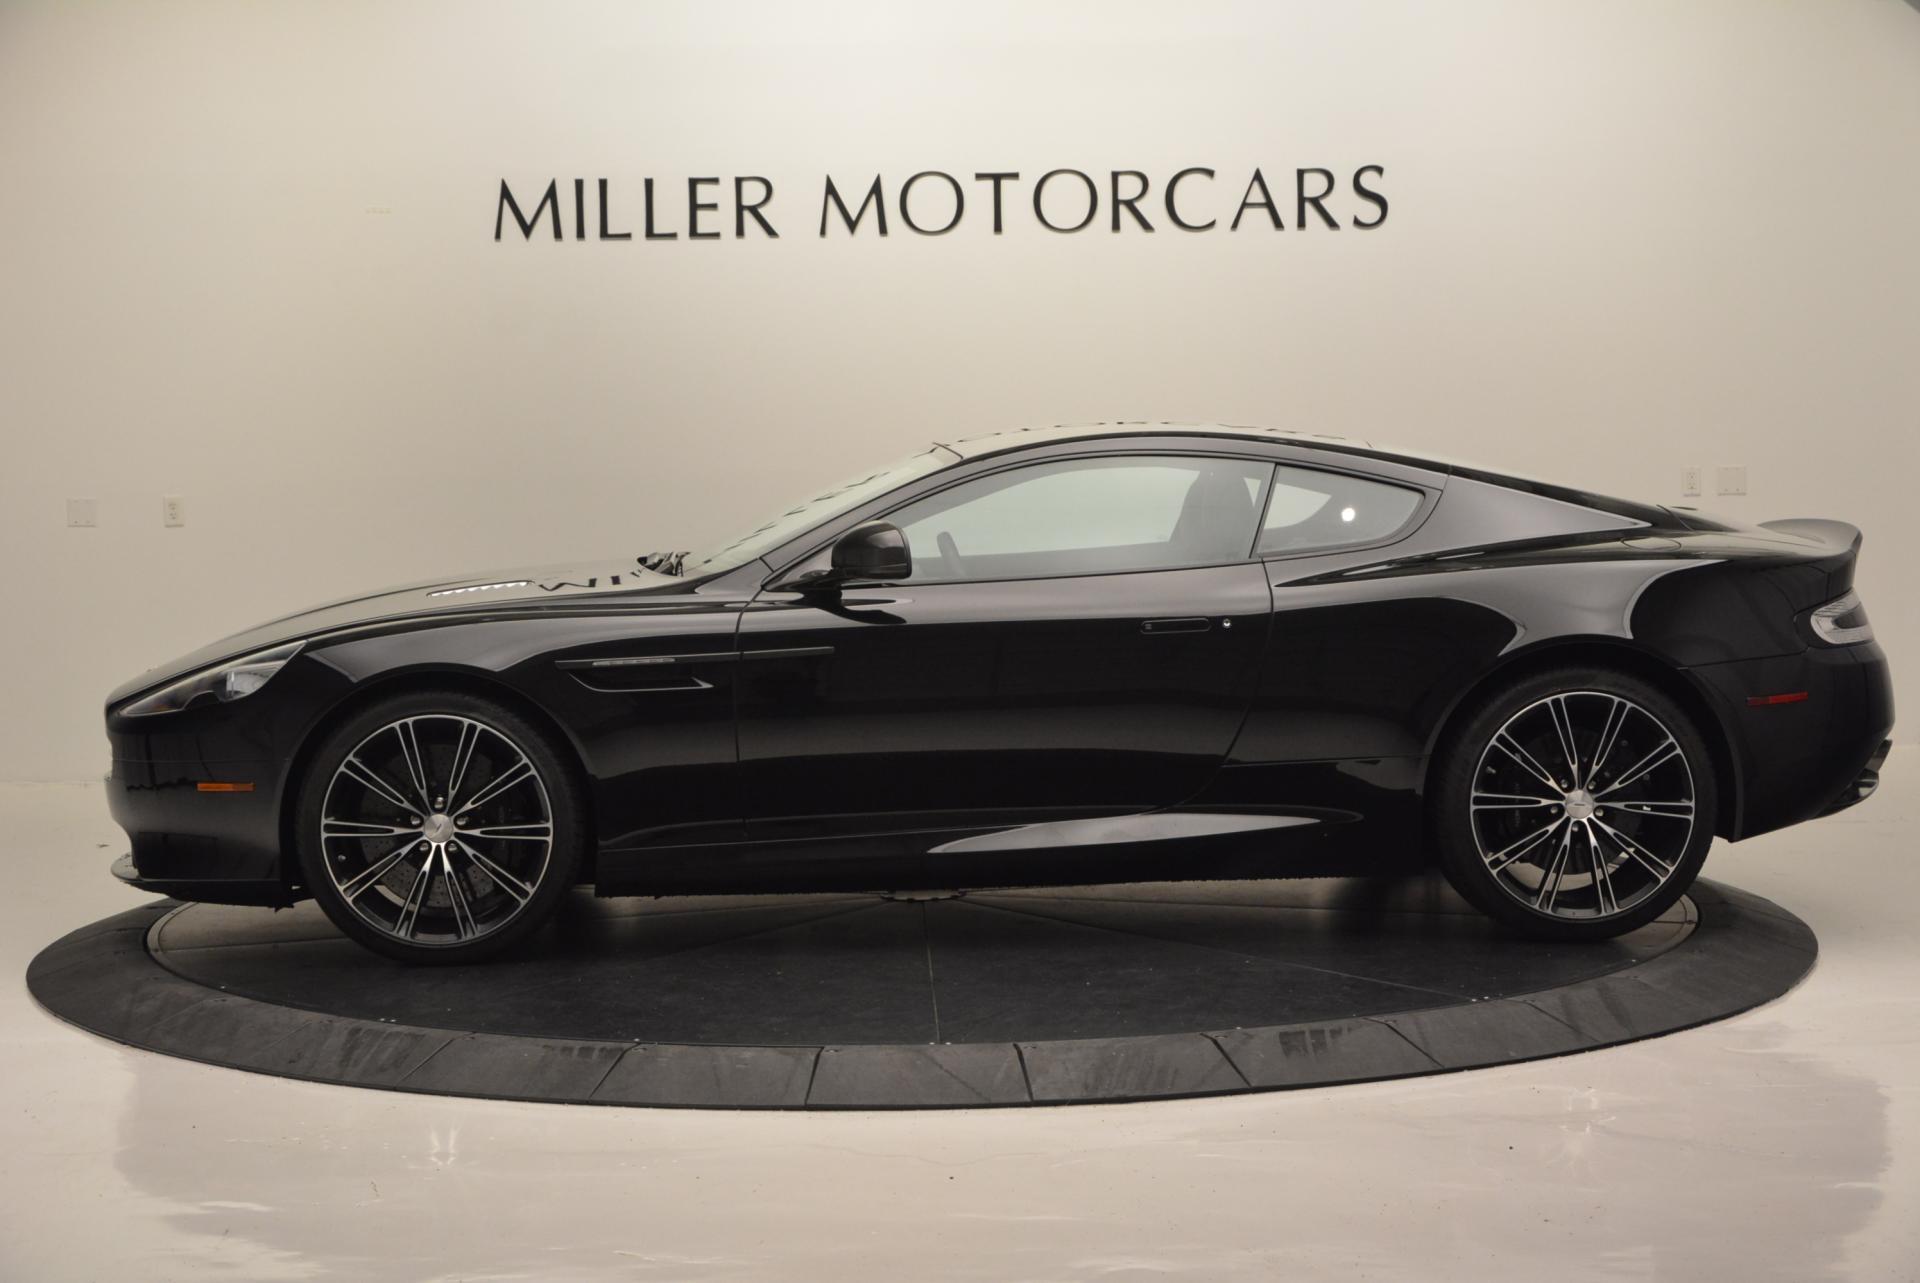 Used 2015 Aston Martin DB9 Carbon Edition For Sale In Greenwich, CT. Alfa Romeo of Greenwich, 7349 528_p3